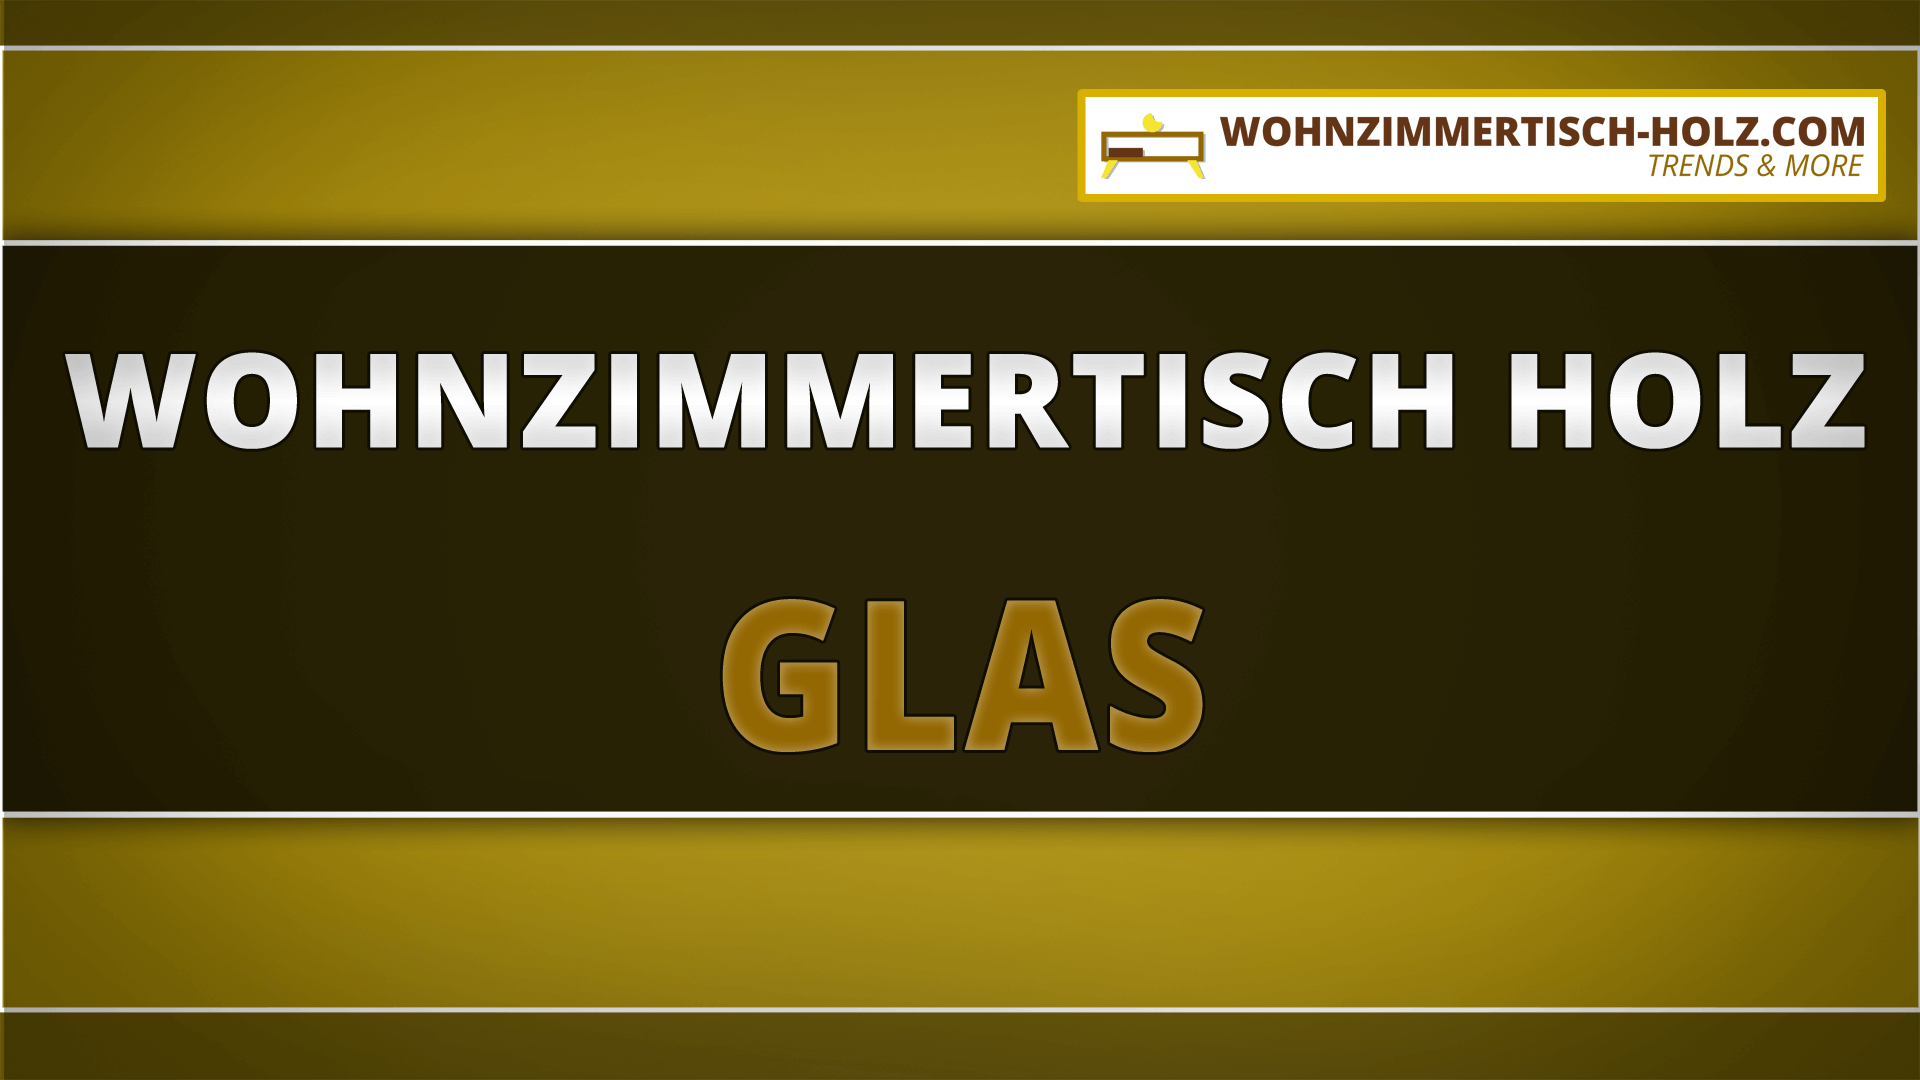 Wohnzimmertisch Holz Glas : Wohnzimmertisch holz glas gt jevelry inspiration für